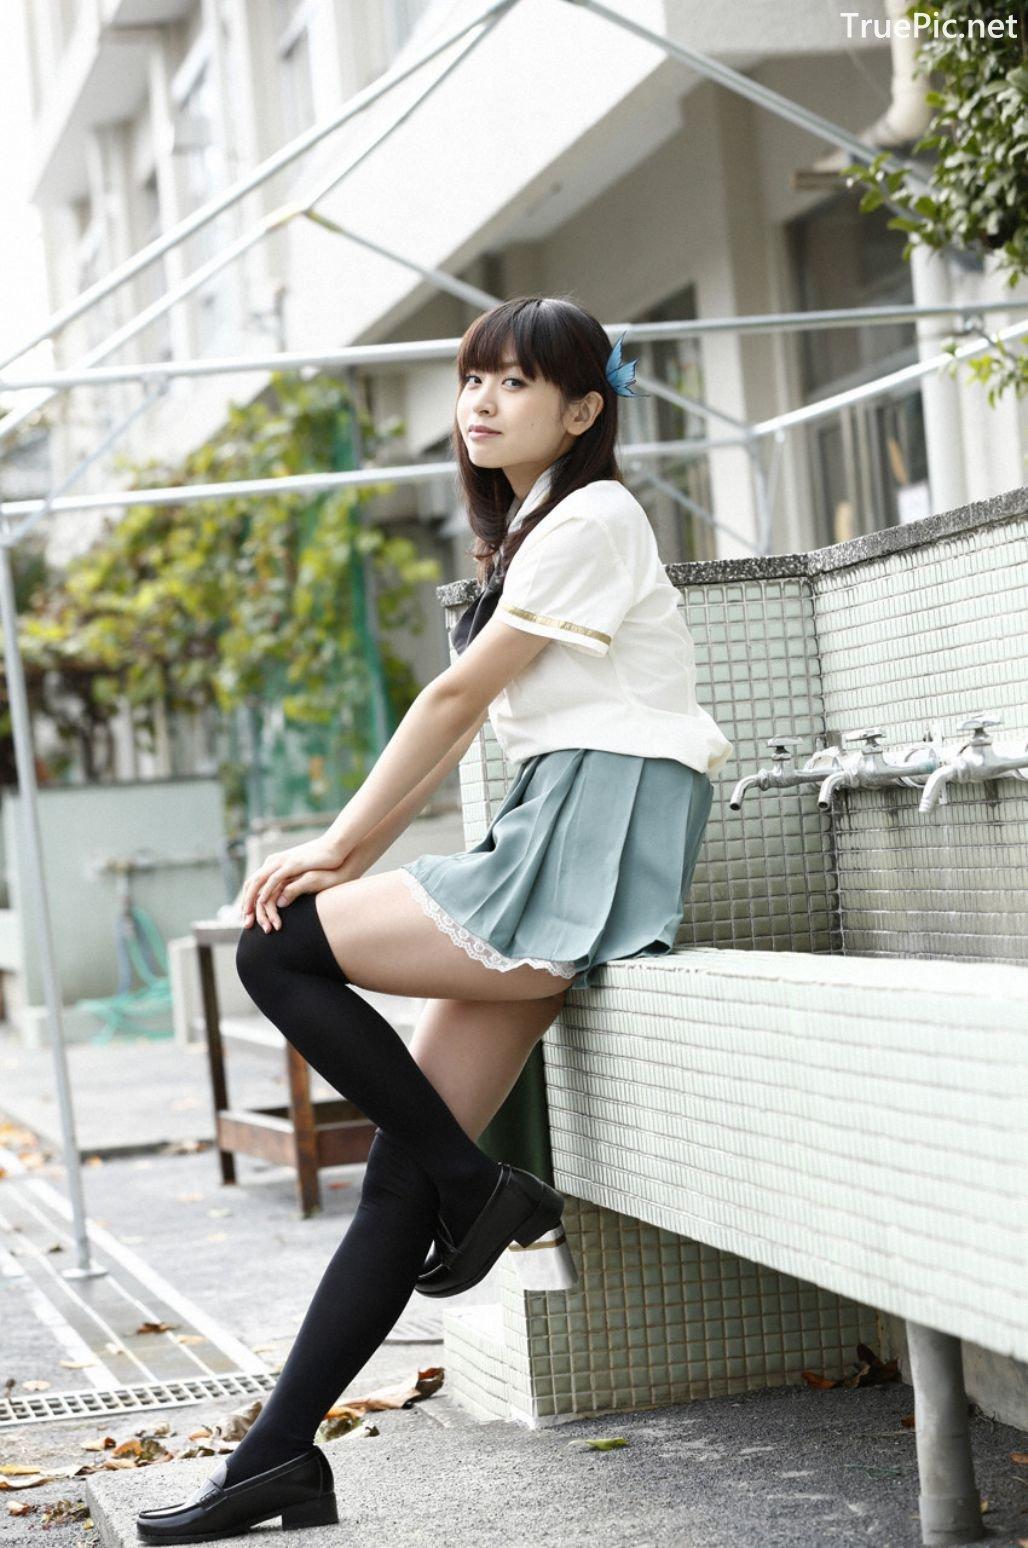 Image-Japanese-Gravure-Idol-Mio-Otani-Photos-Purity-Miss-Magazine-TruePic.net- Picture-7